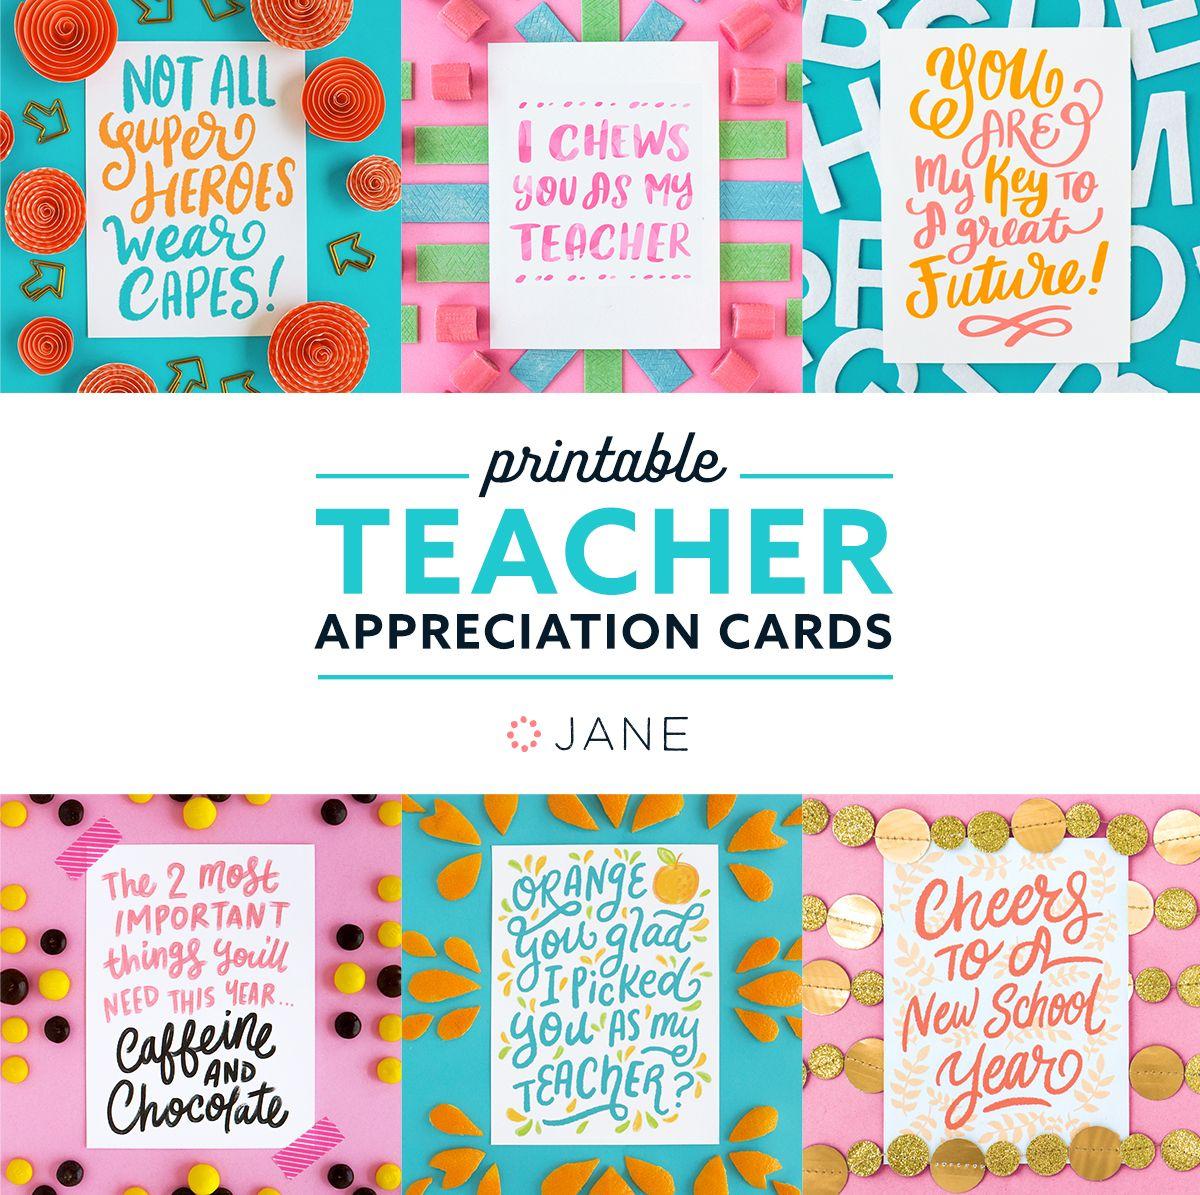 Jane Free Teacher Appreciation Printable Cards | Teacher - Free Teacher Appreciation Week Printable Cards